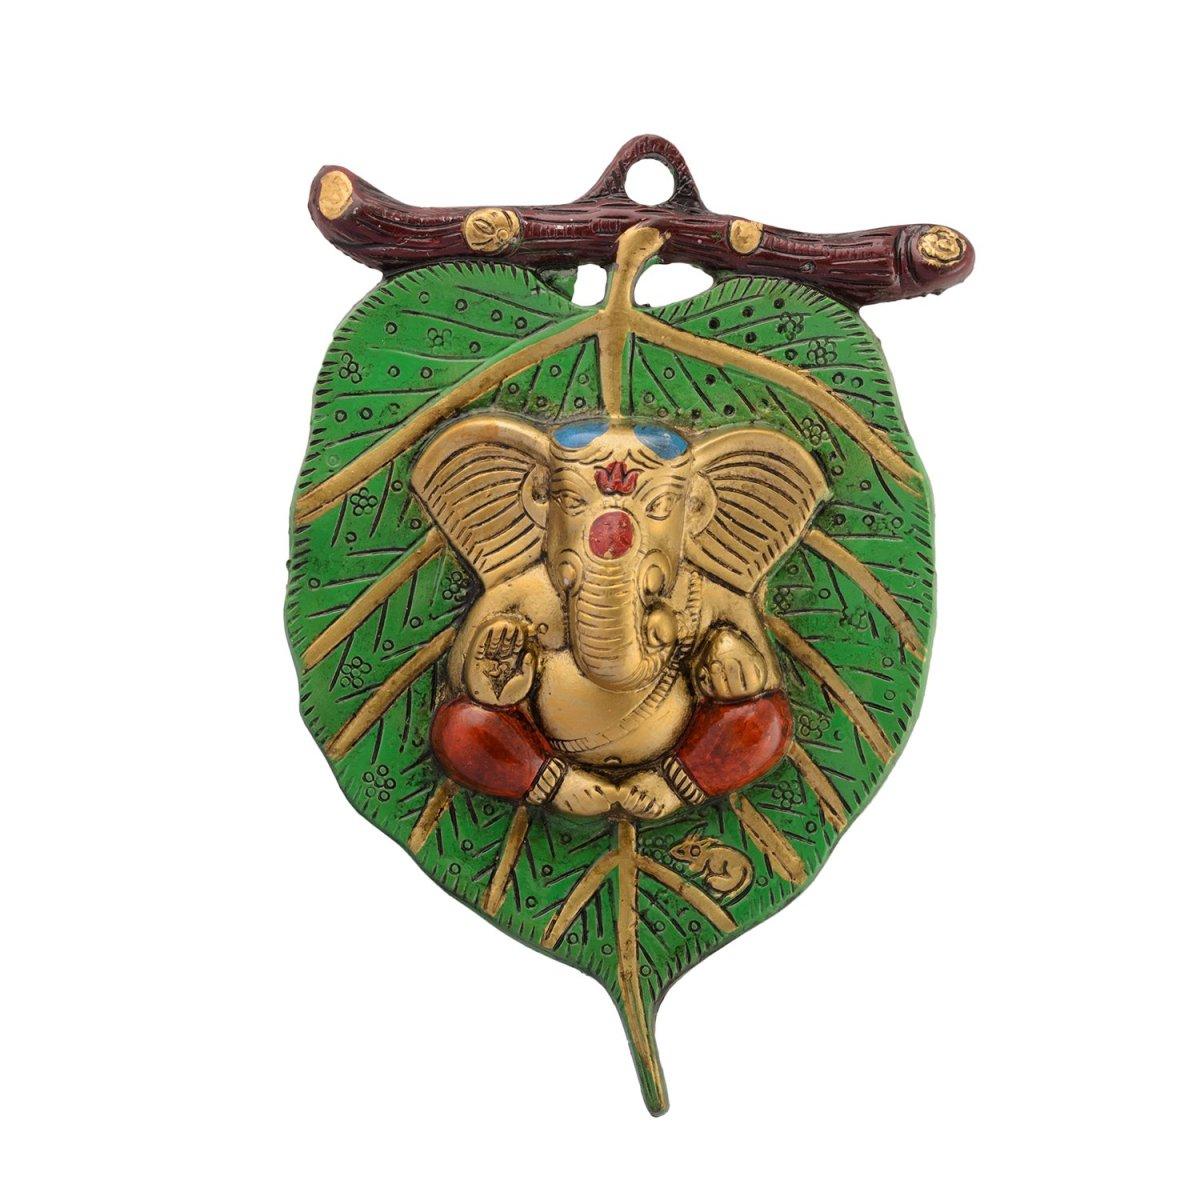 craft India Lord Ganesha on Leaf White Metal Wall Hanging (15 cm x 1.25 cm x 22.5 cm)